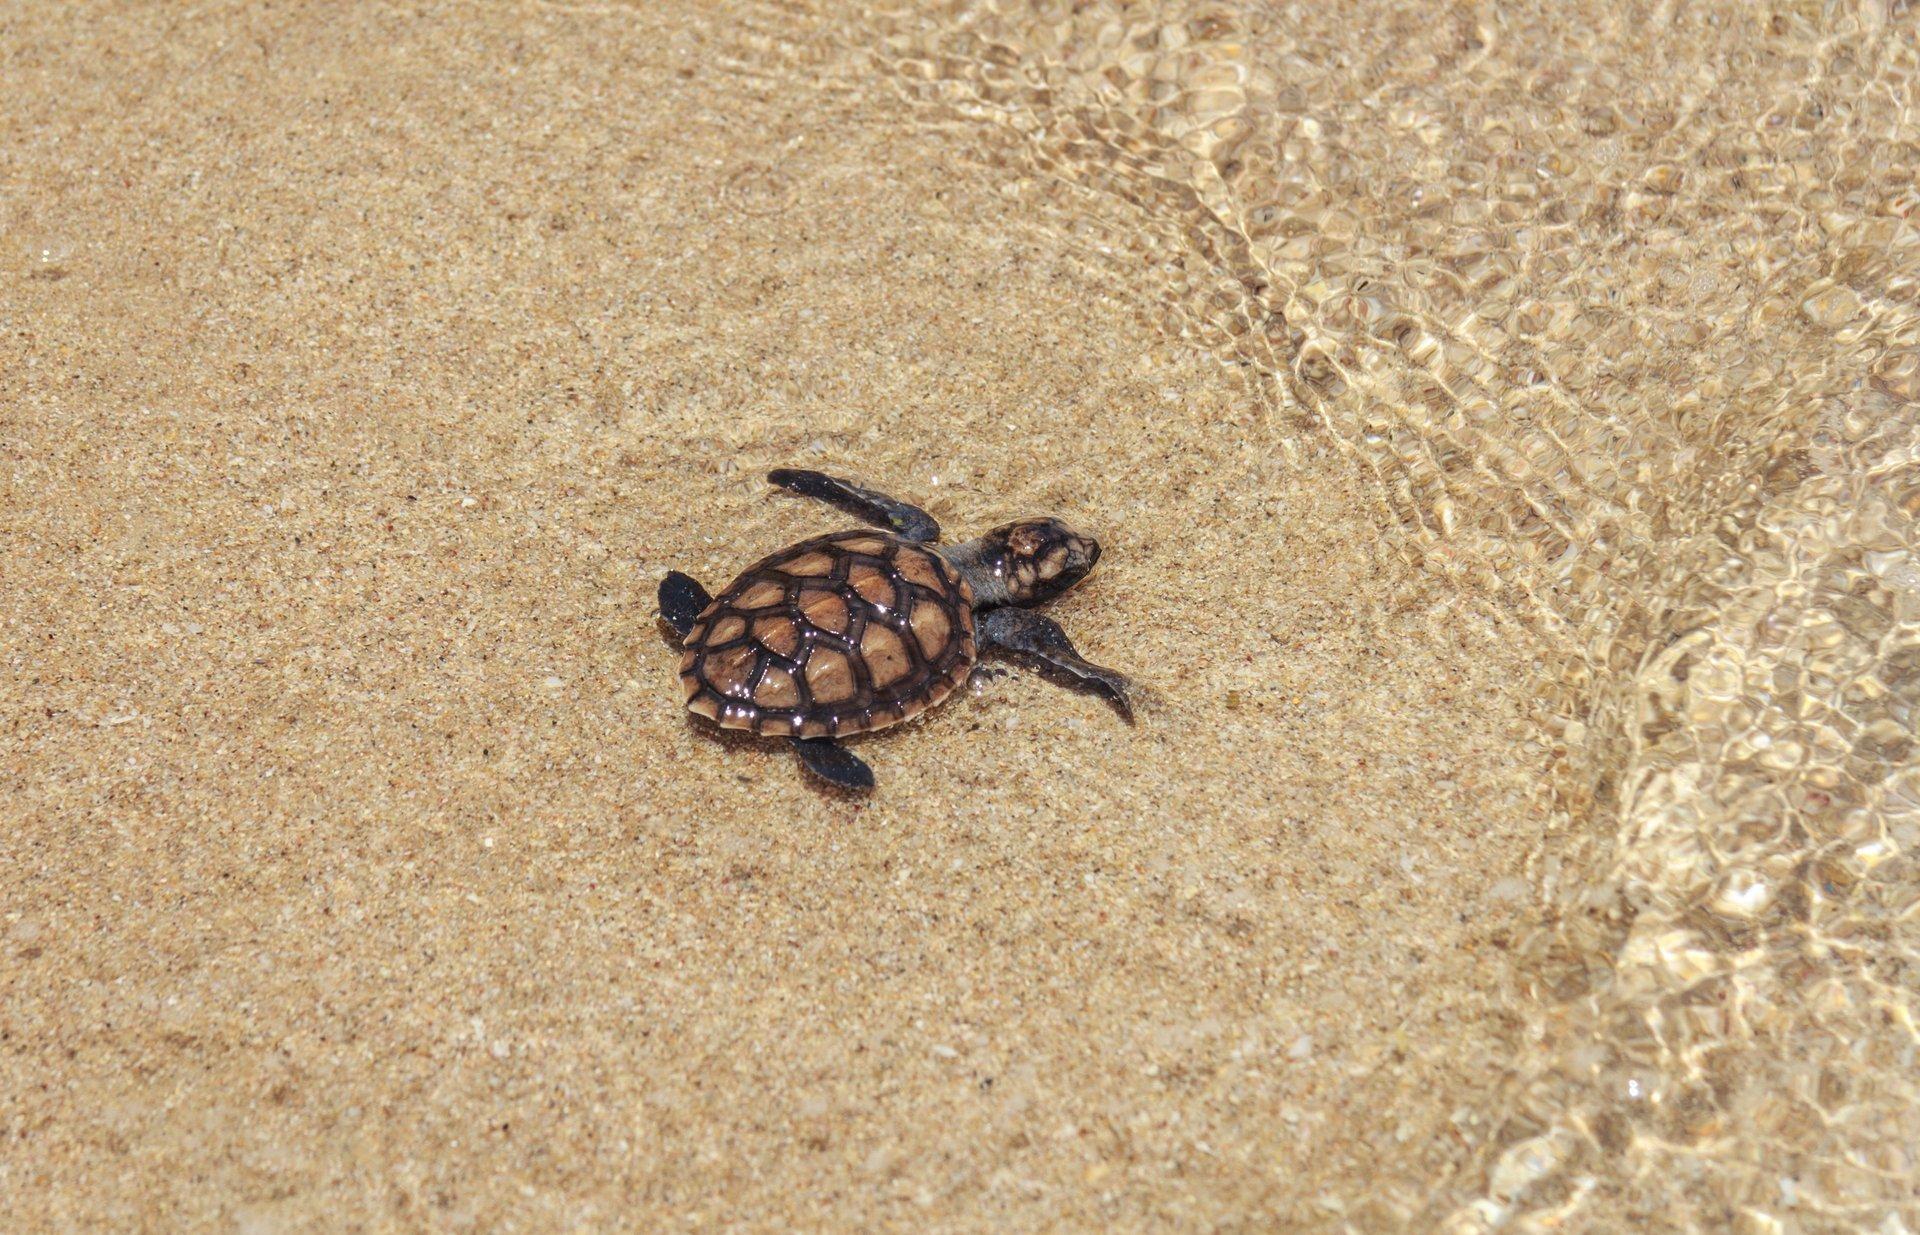 Baby Turtles Hatching Season in Bora Bora 2020 - Best Time